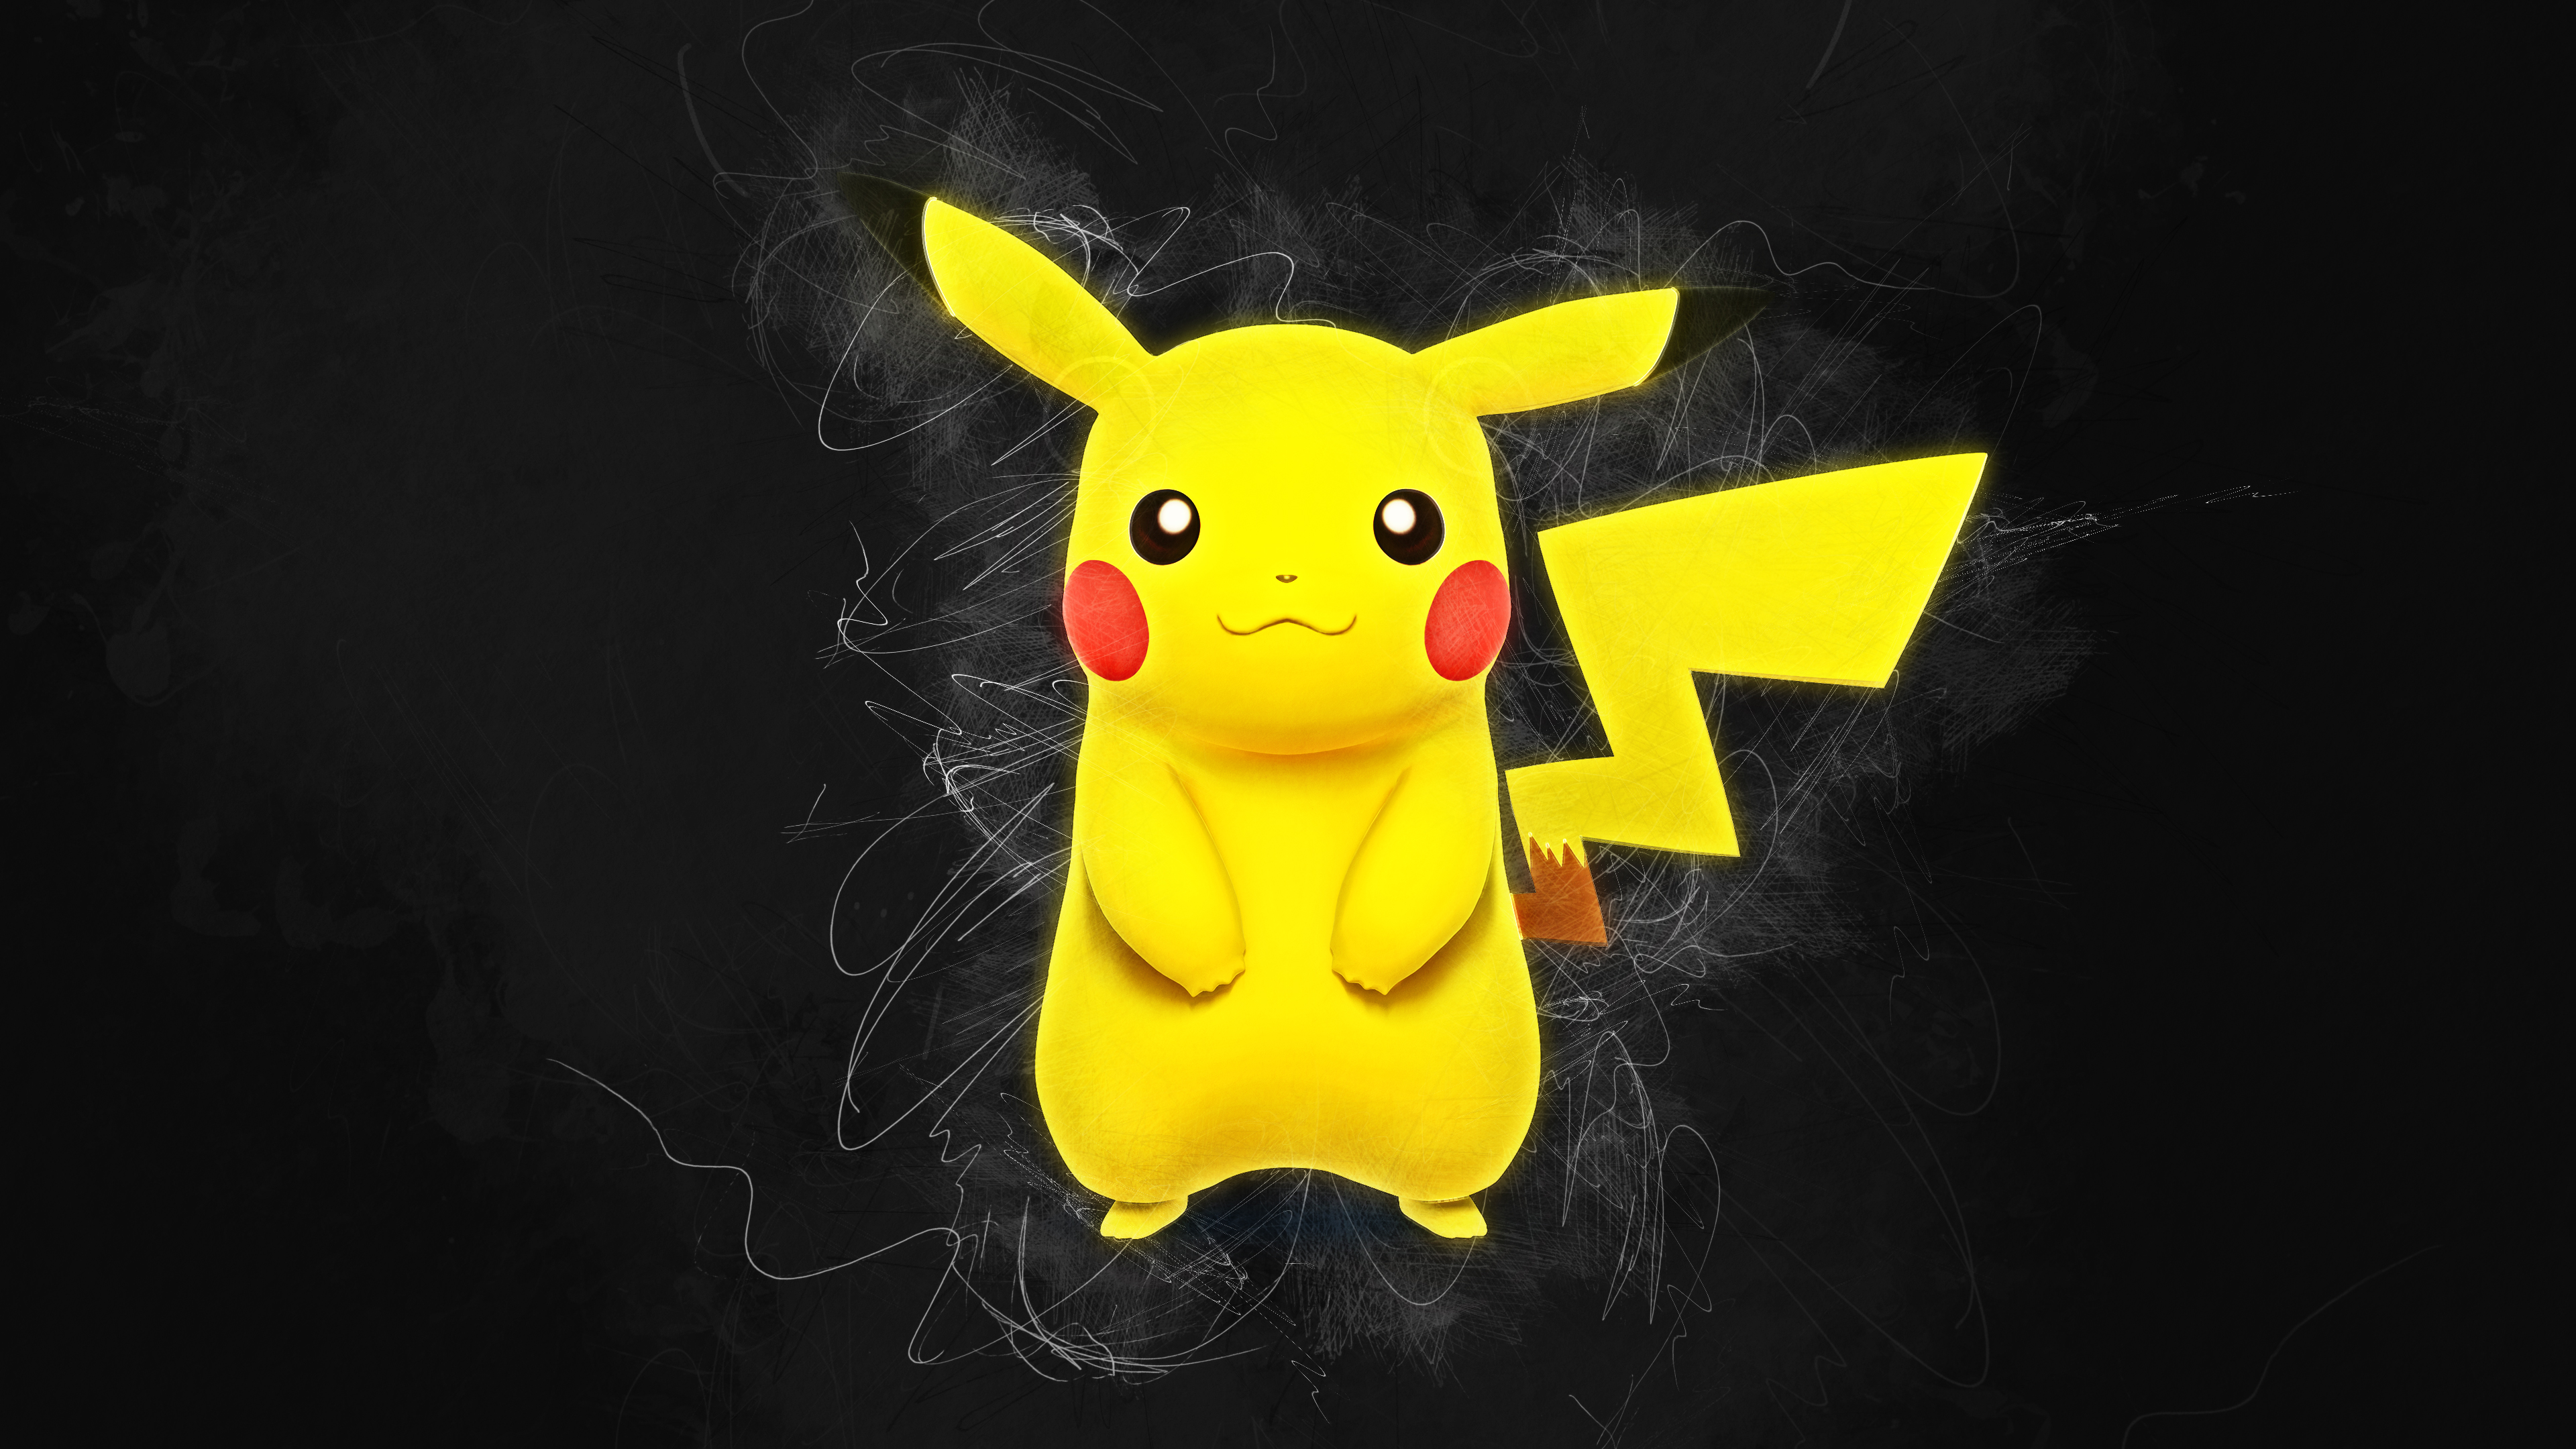 Pikachu 4k Ultra HD Wallpaper   Background Image ...